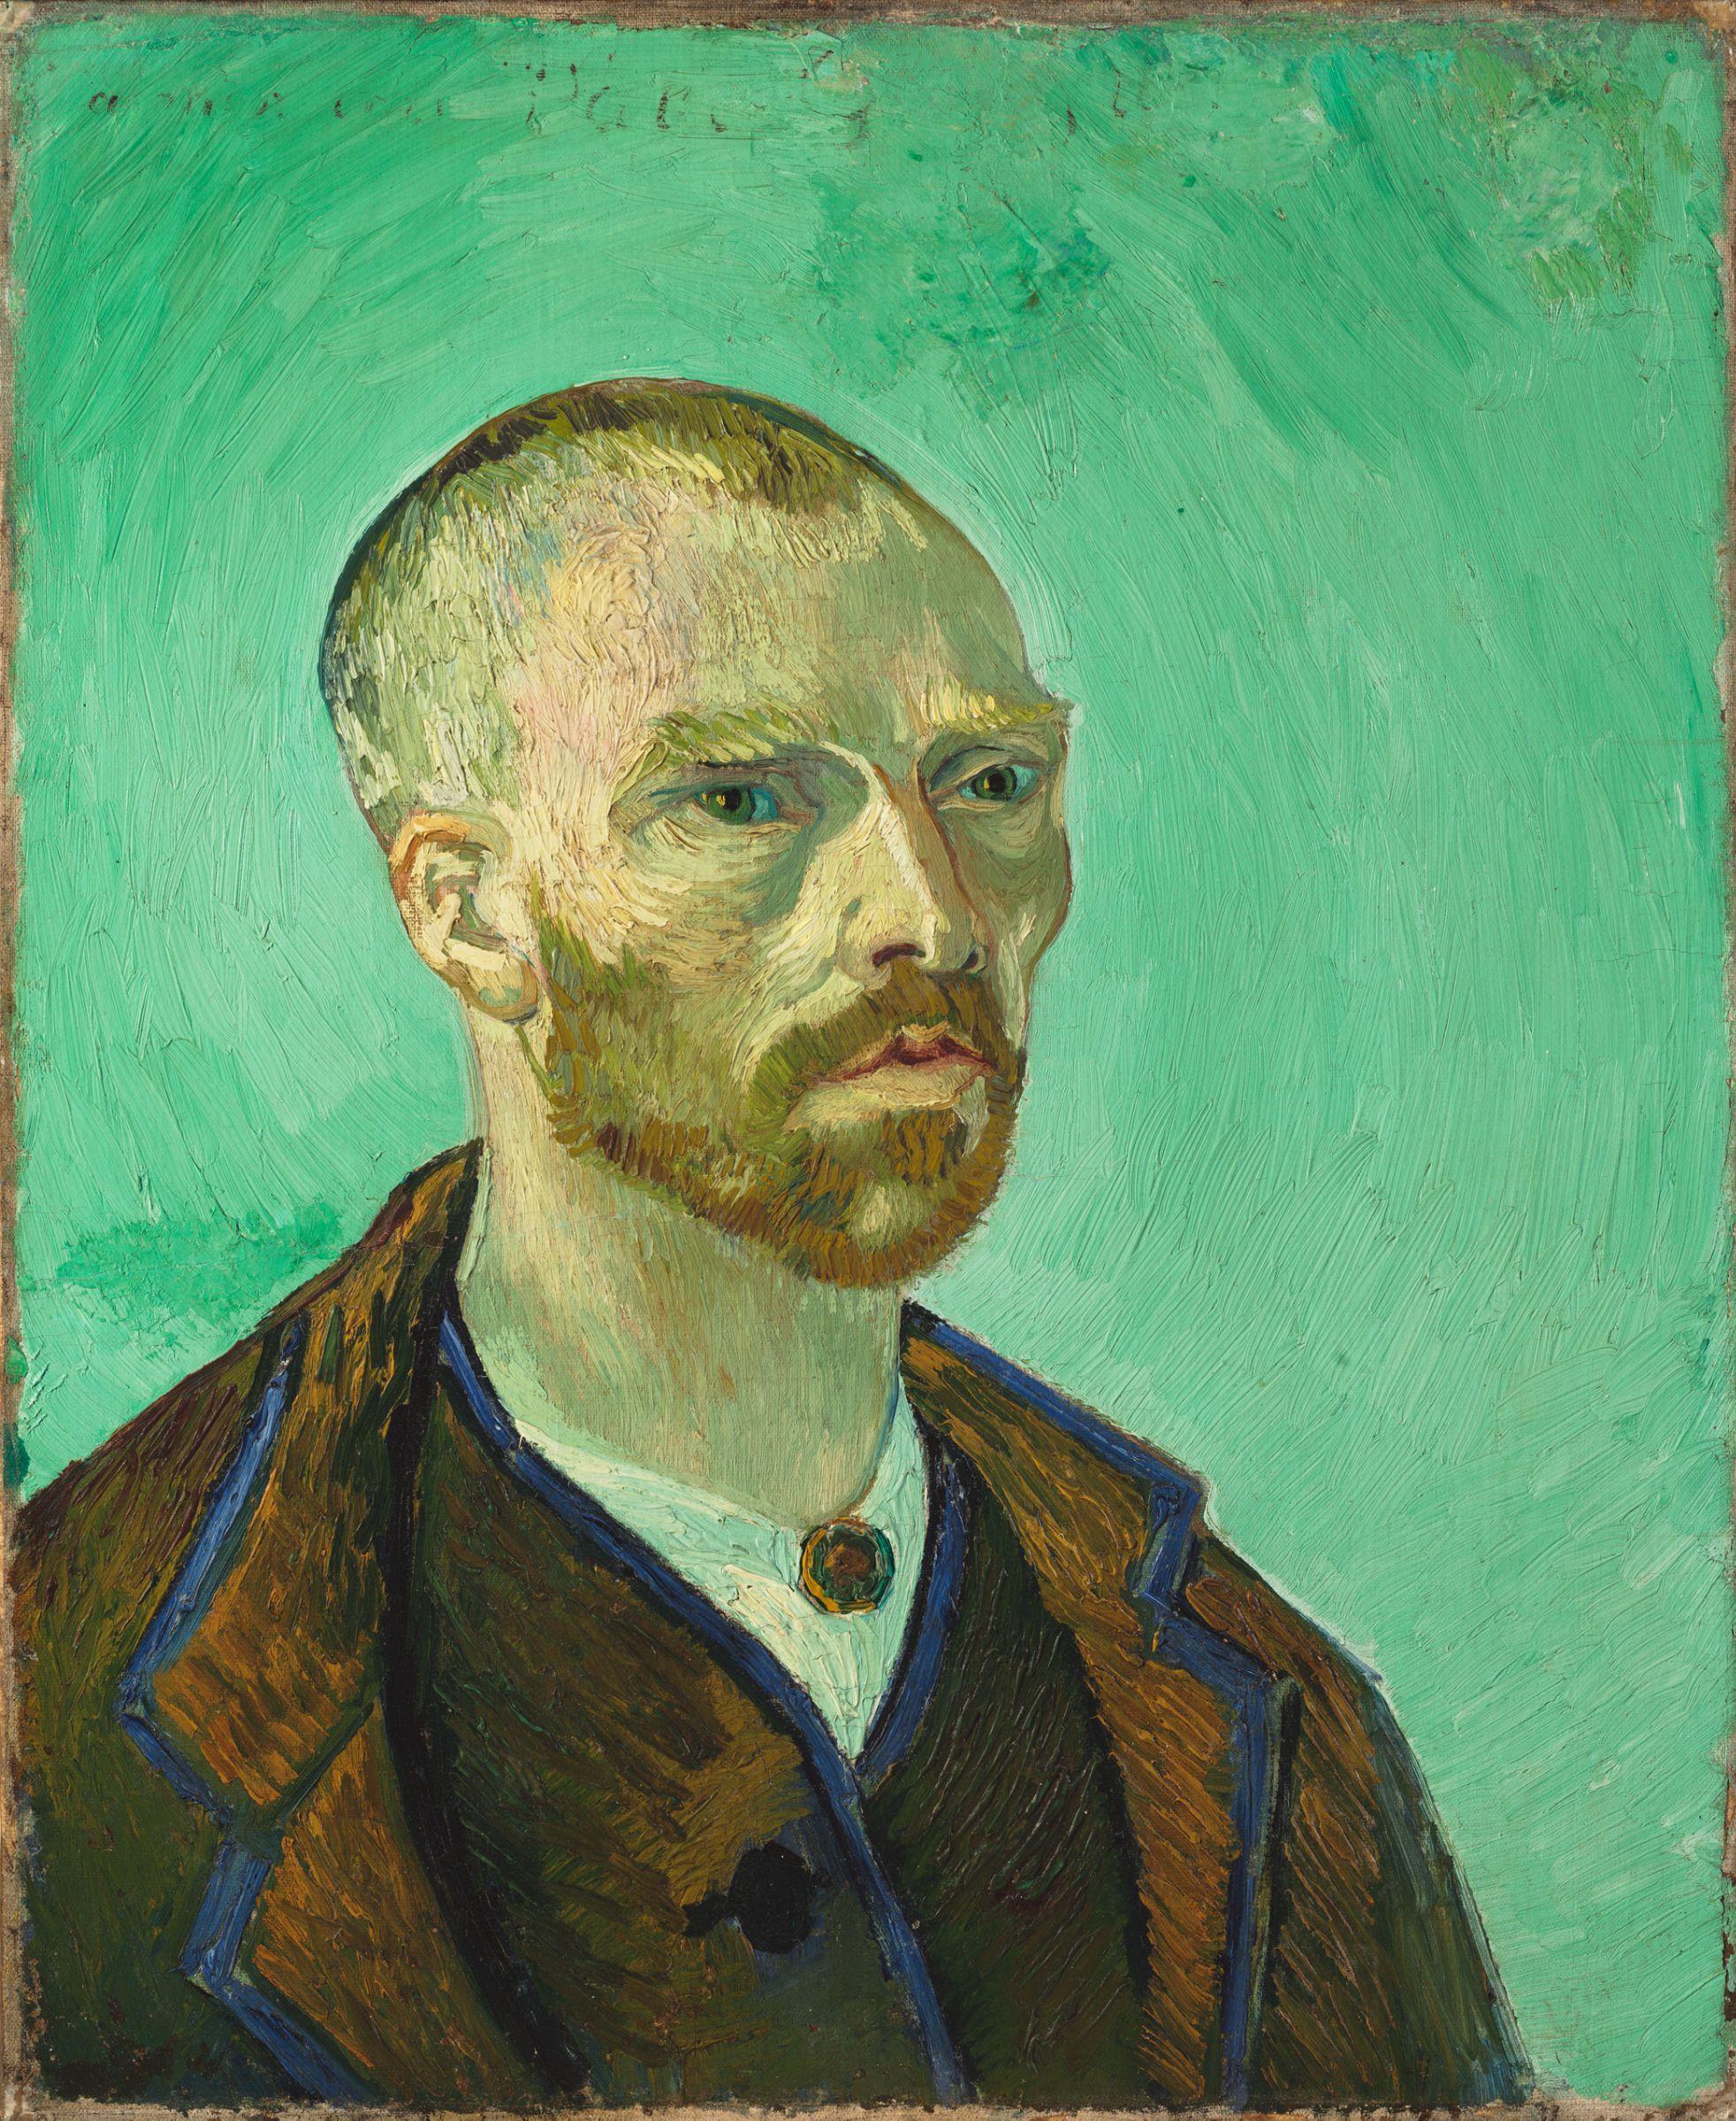 Character Design Harvard : Van gogh self portrait dedicated to paul gauguin